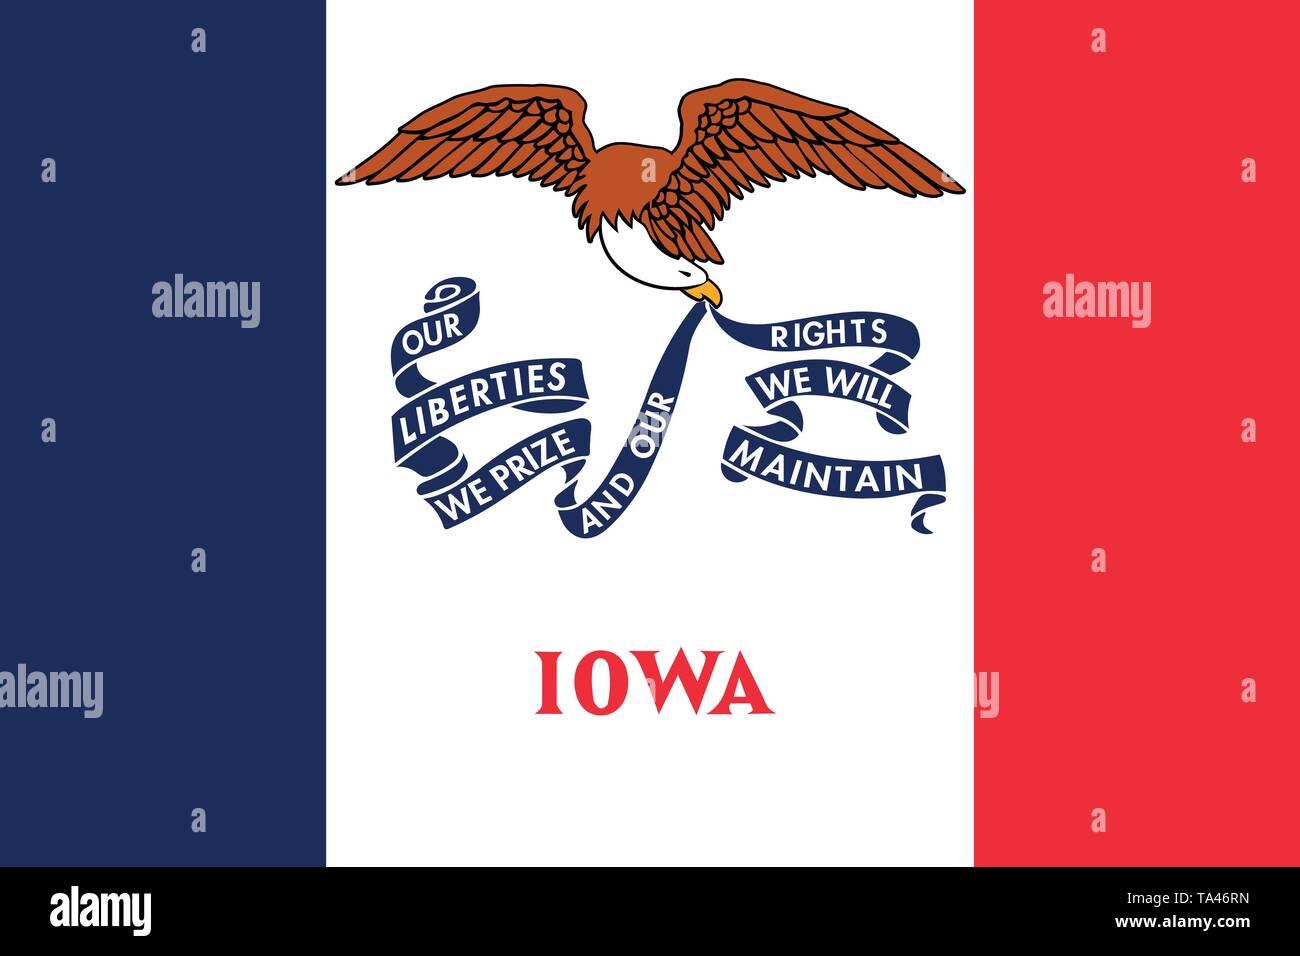 Iowa flag. Vector illustration. United States of America. - Stock Image